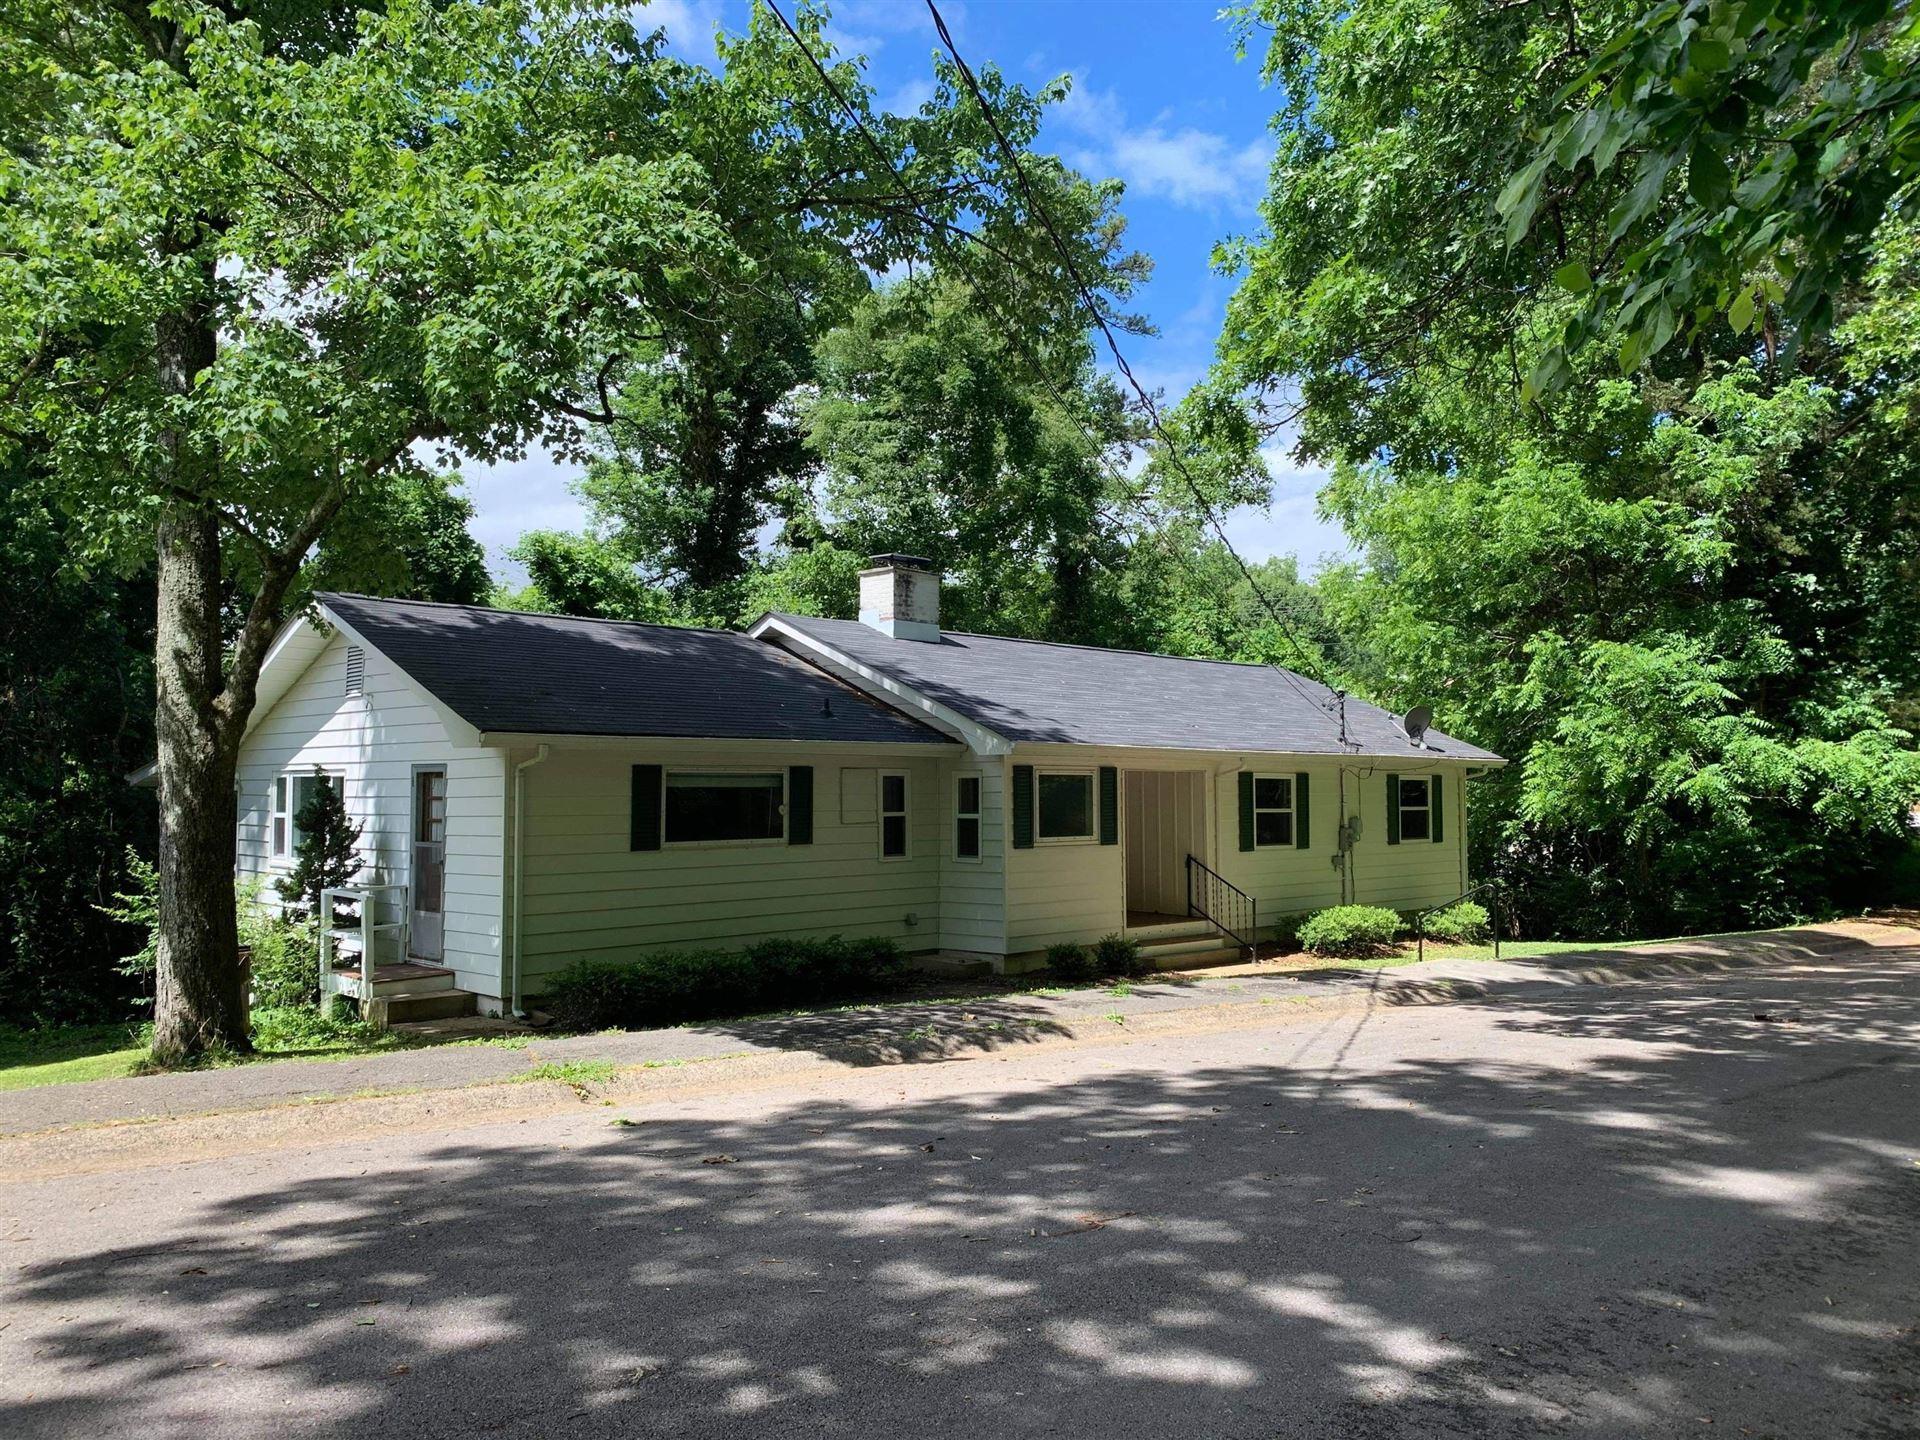 Photo of 101 Disston Rd, Oak Ridge, TN 37830 (MLS # 1154826)